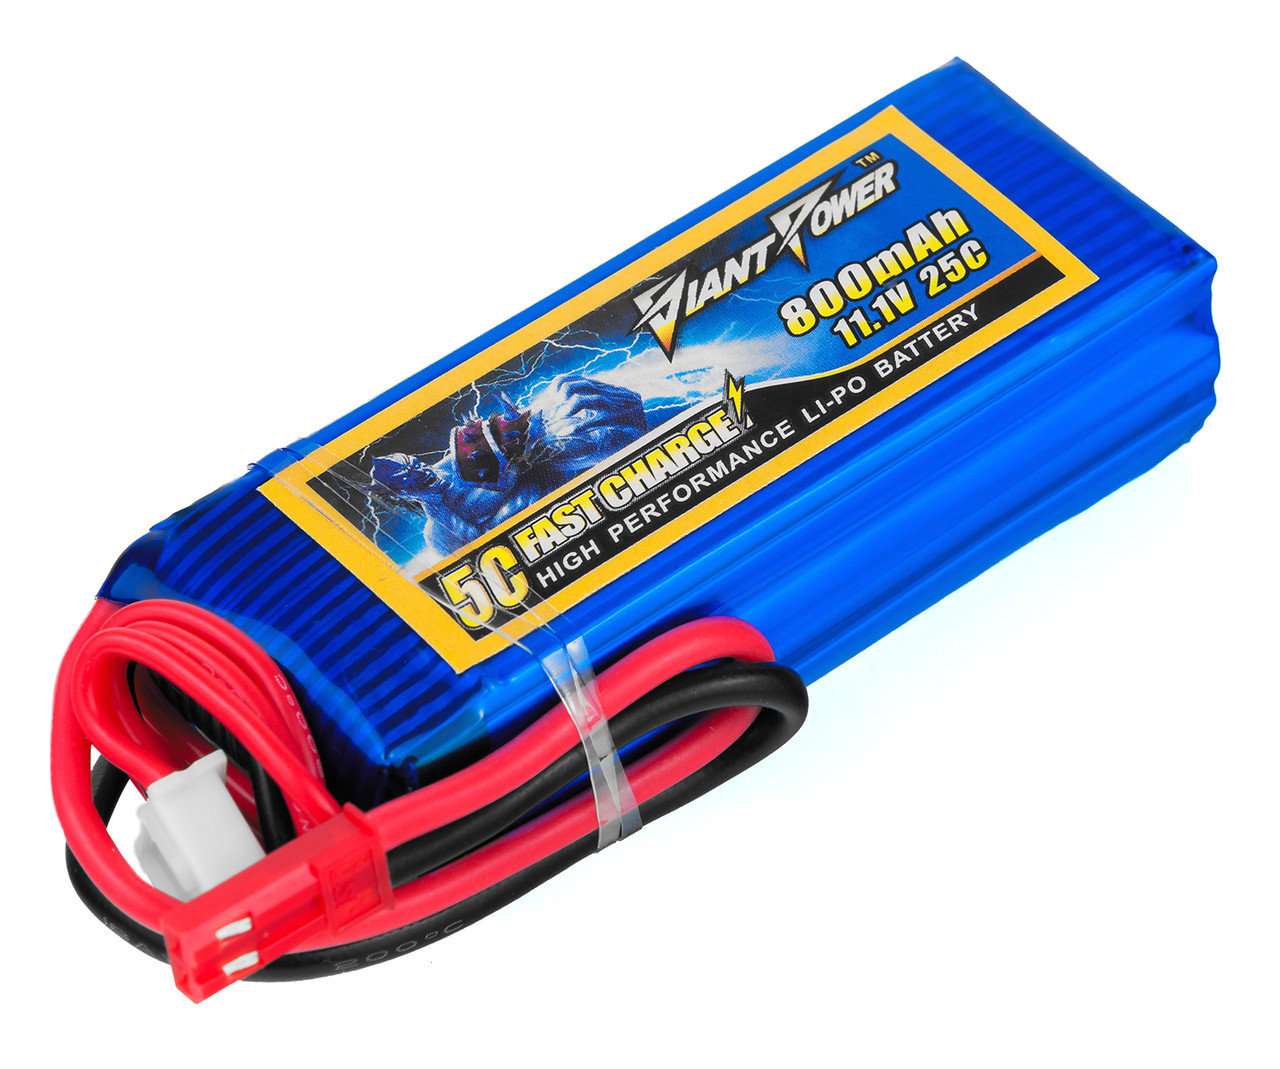 Аккумулятор Giant Power (Dinogy) Li-Pol 800mAh 11.1V 3S 25C 17x25x68мм JST